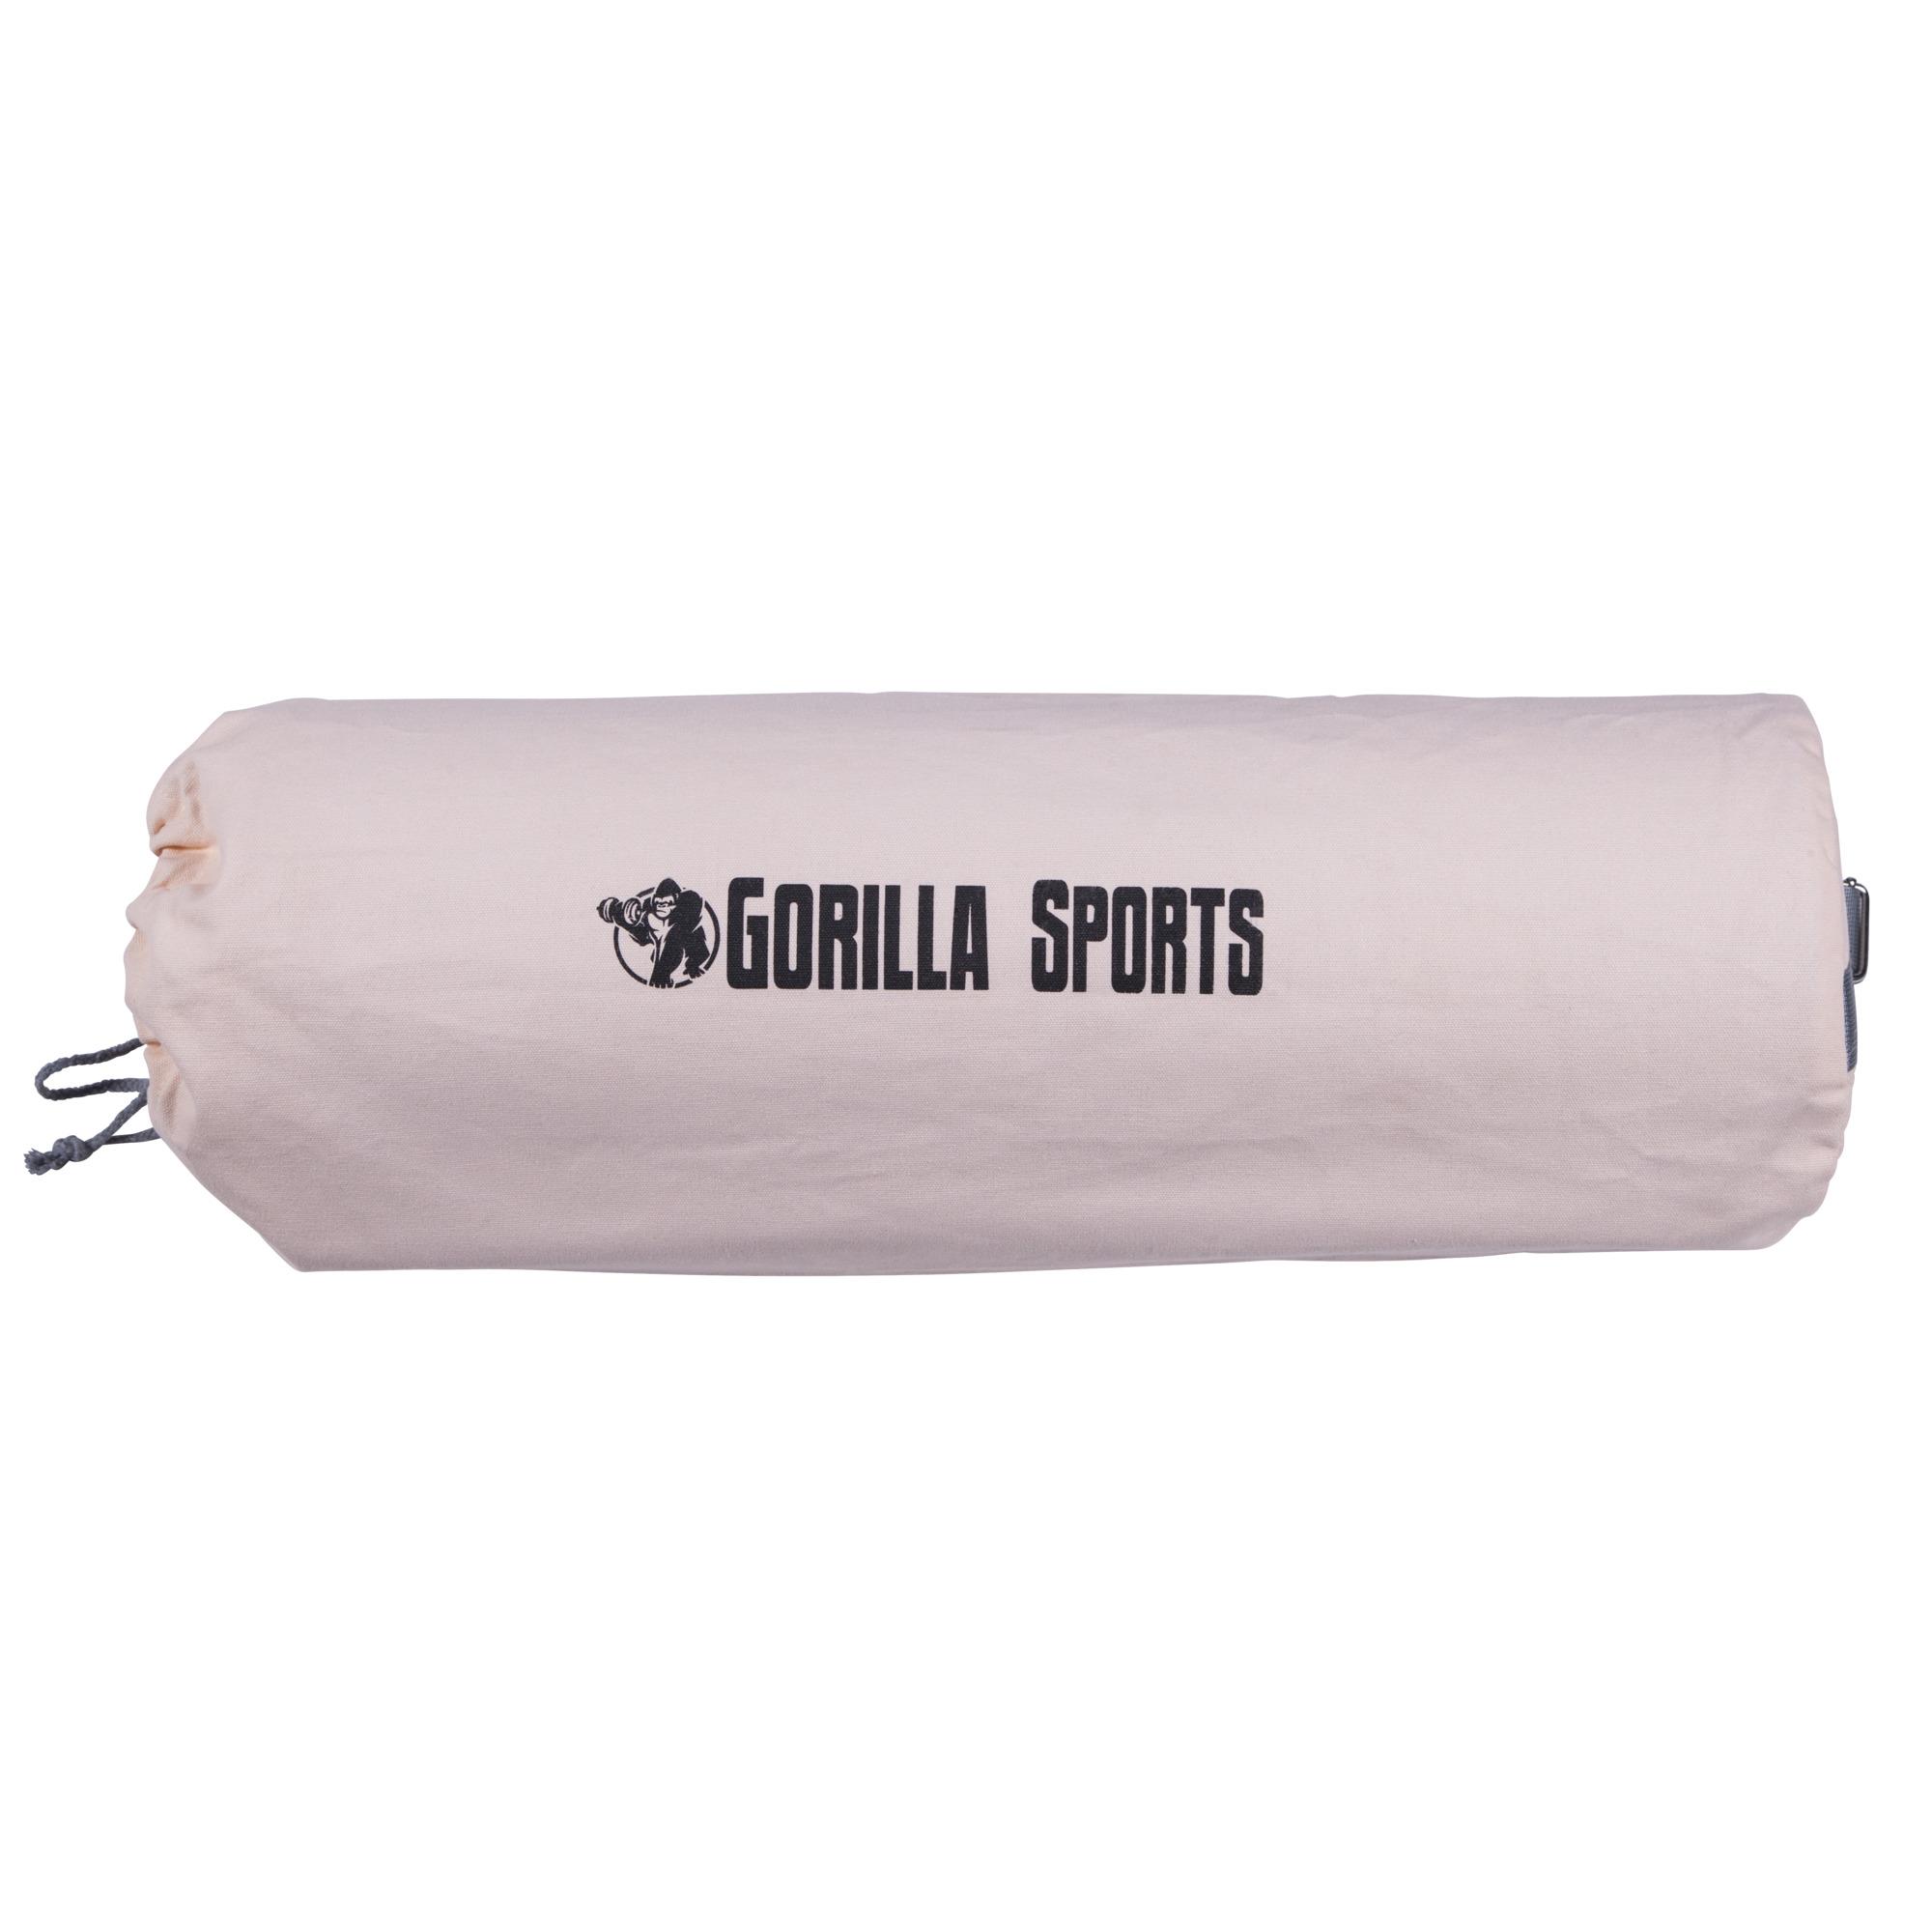 Gorilla Sports Yogatasche Rosa 190 x 60 cm 100966-00037-0001